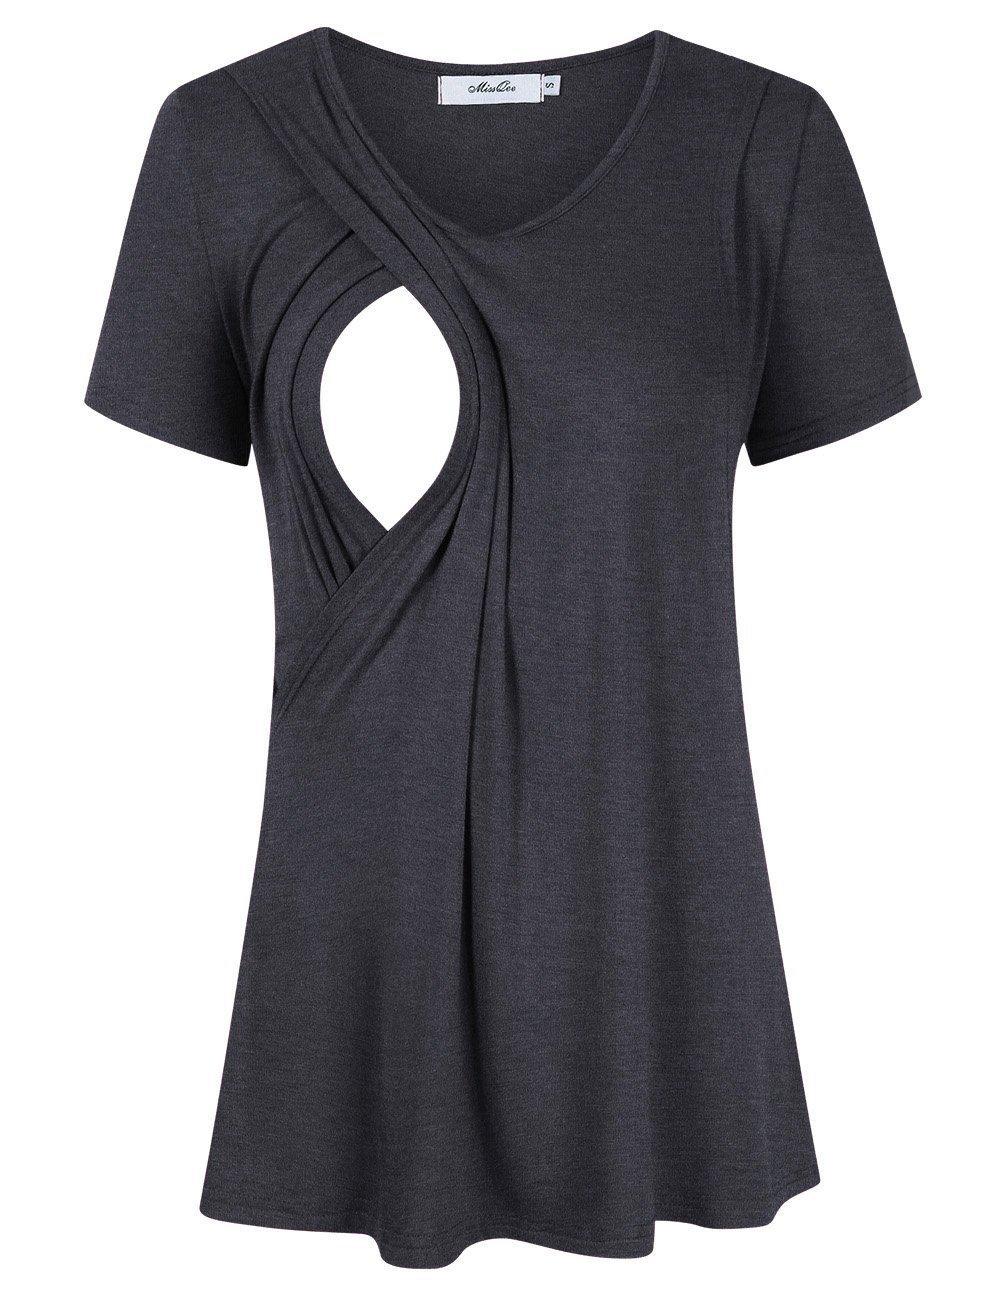 MissQee Maternity Nursing Tops Short Sleeve Breastfeeding T-Shirts L Dark Gray